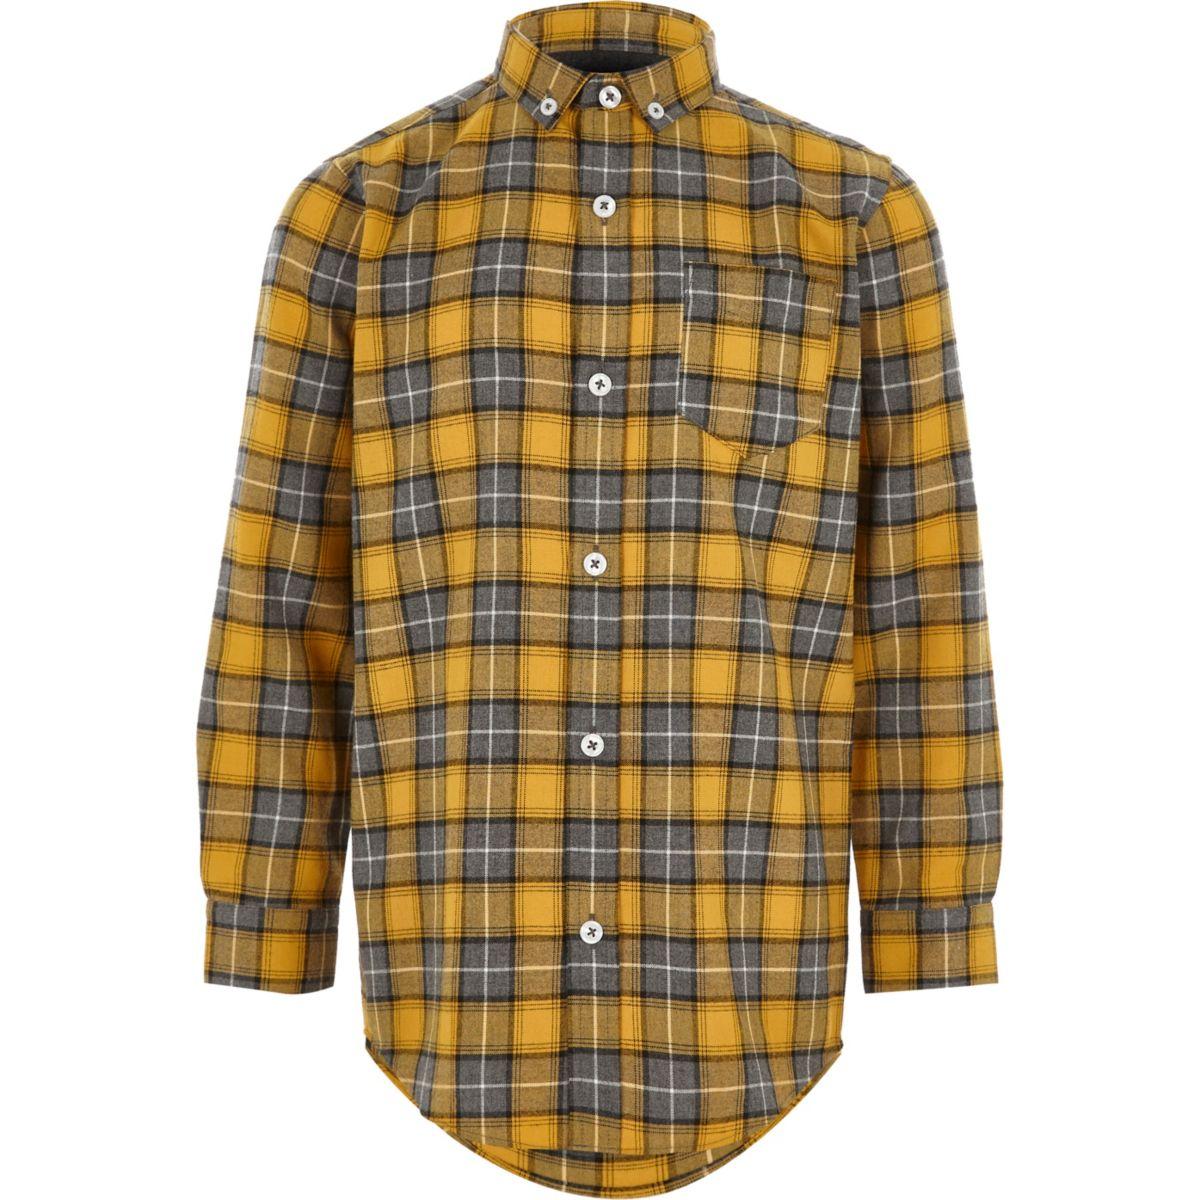 Boys yellow check long sleeve shirt